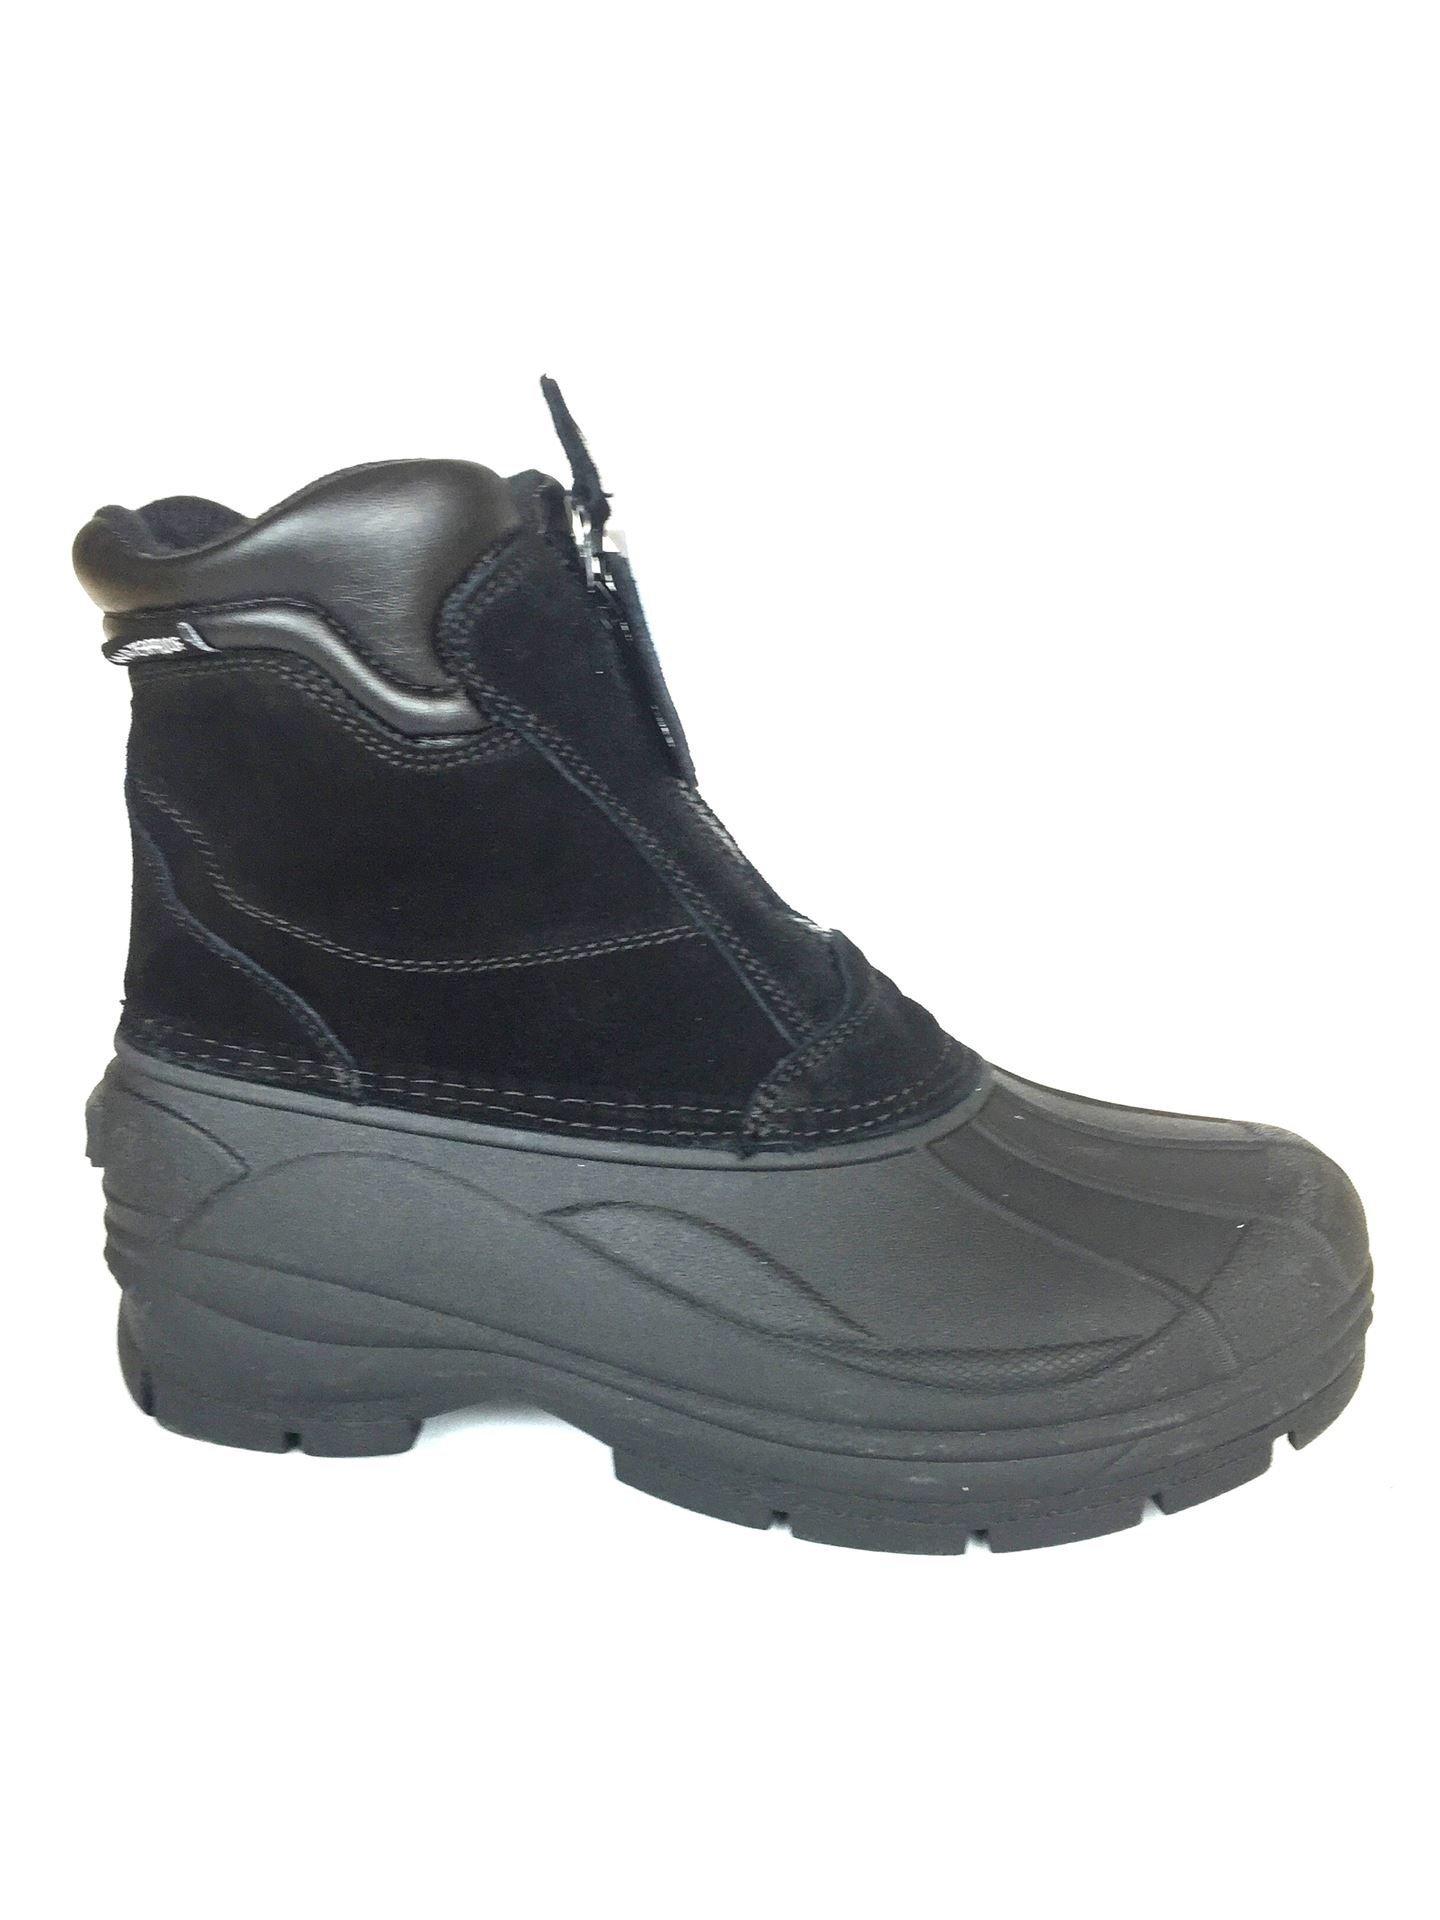 6'' Duck Snow Boot Black Color Size 106A- 6